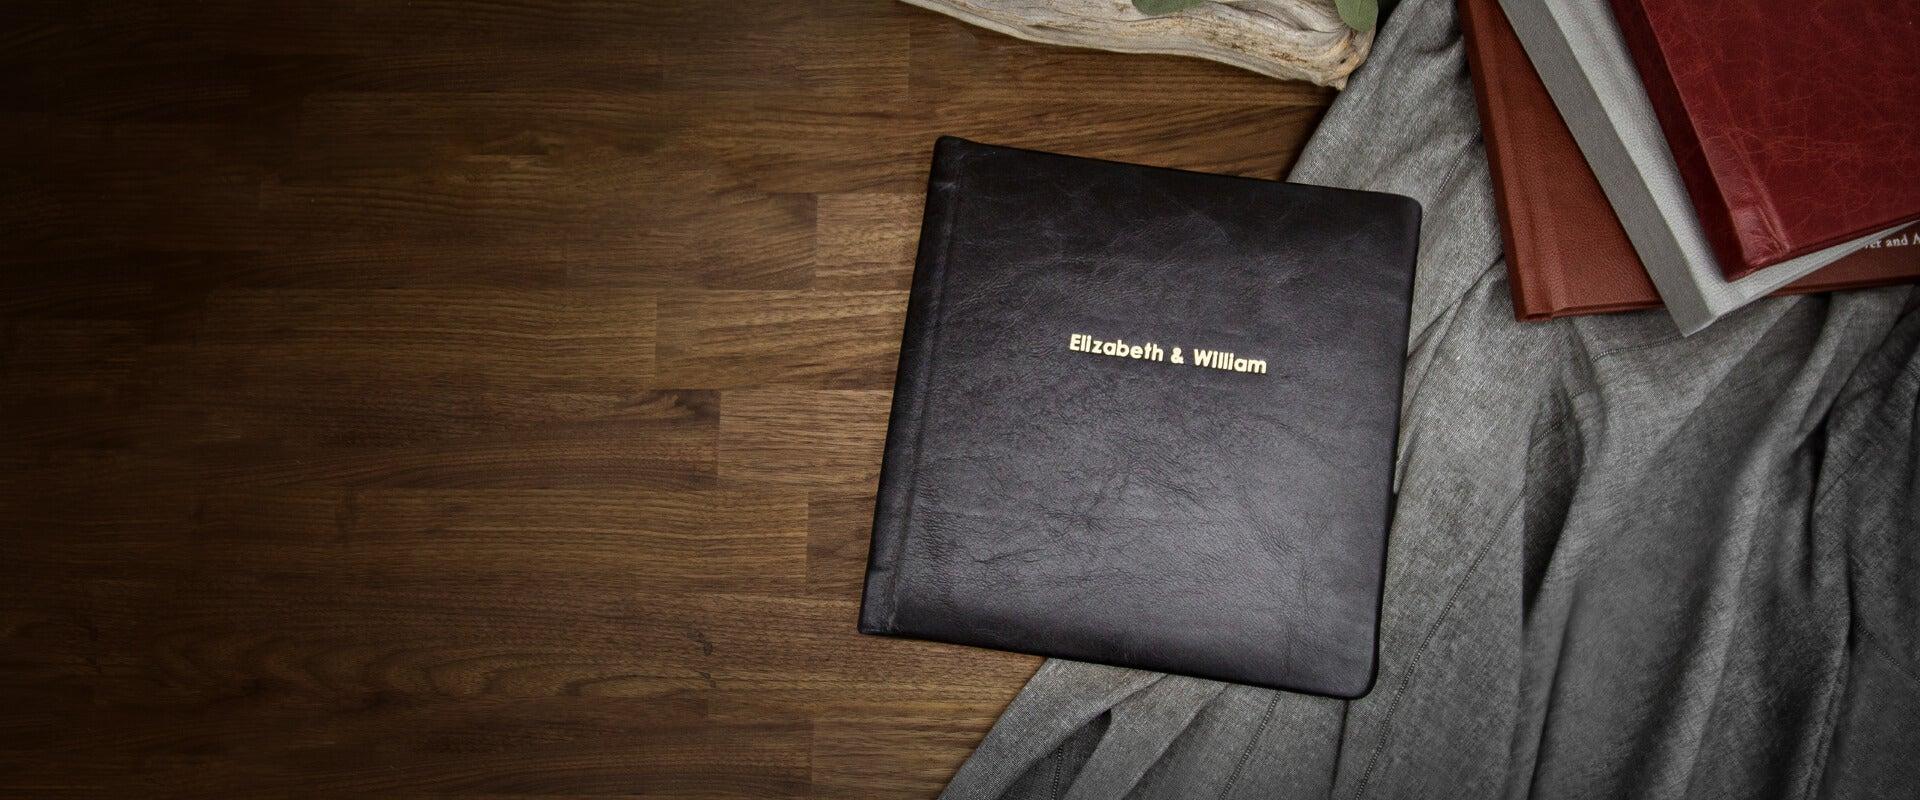 Leather Cover Photo Albums - AdoramaPix